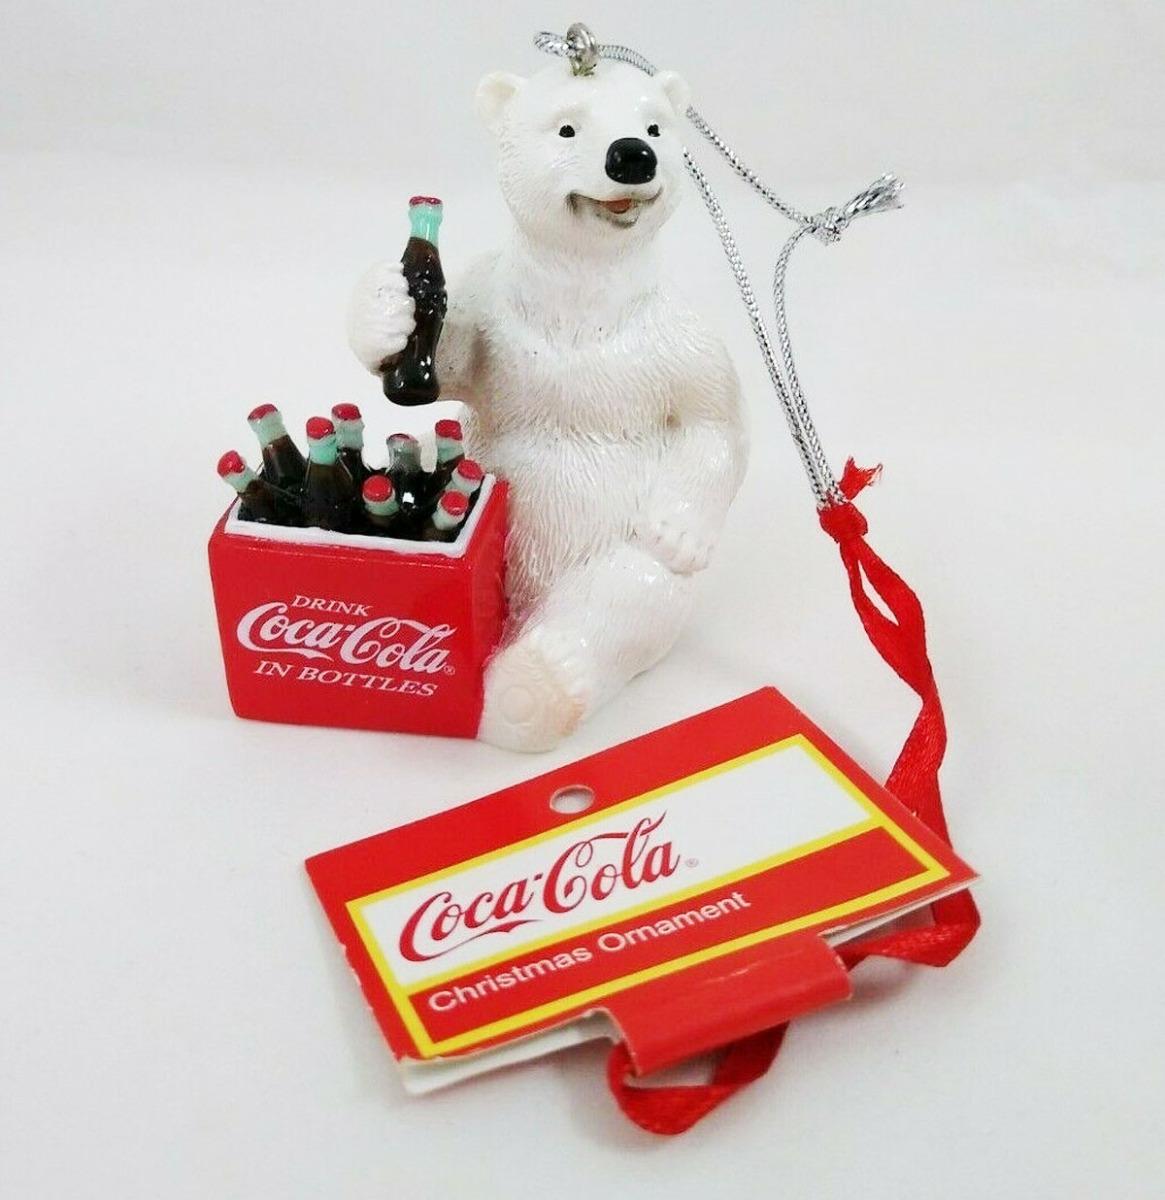 Coca-Cola Polar Bear By Cooler Kersthanger